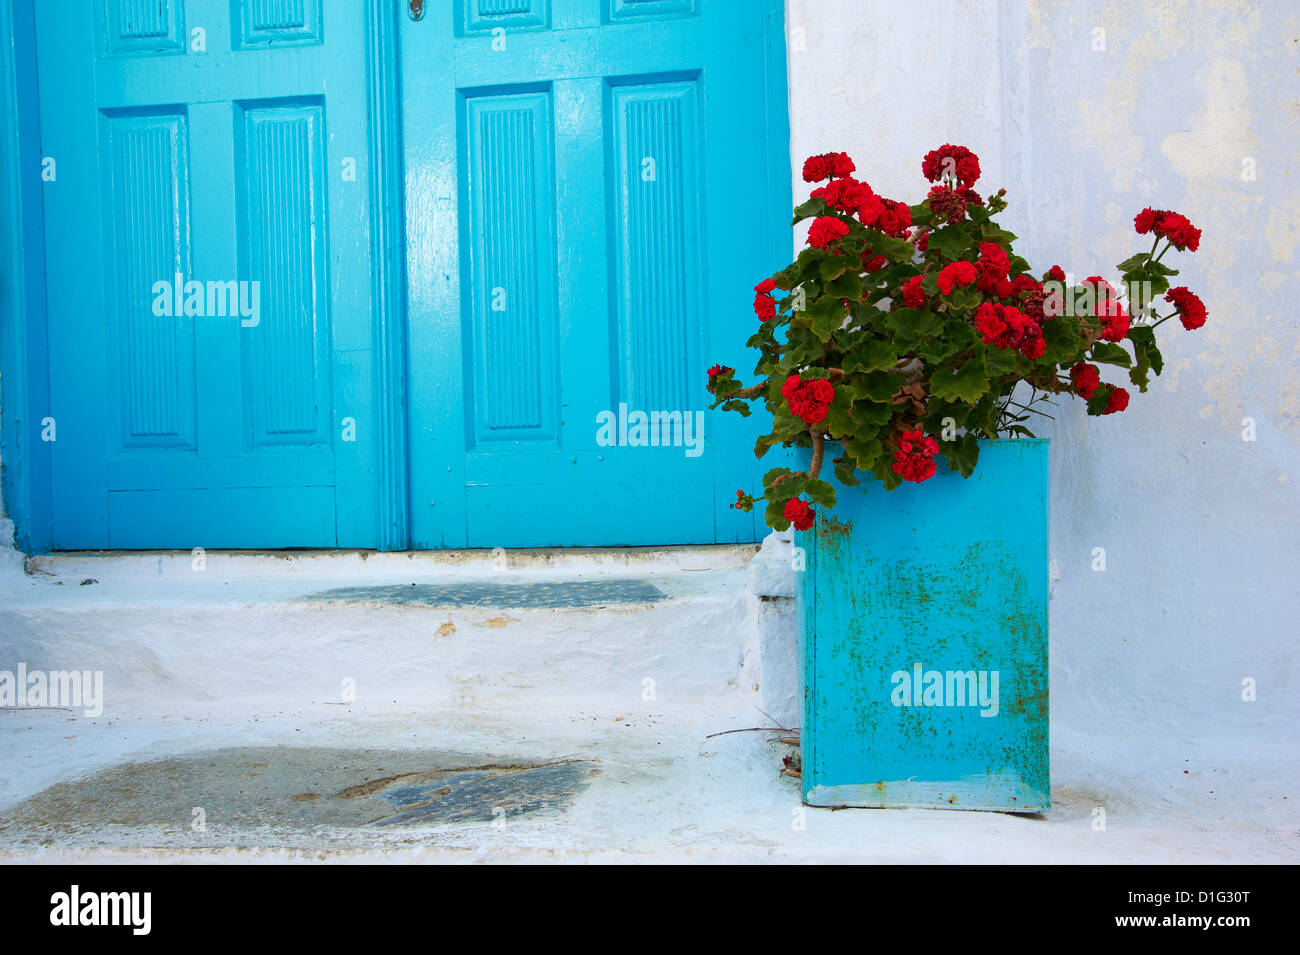 Chora, Amorgos, Cyclades, Mer Égée, îles grecques, Grèce, Europe Photo Stock